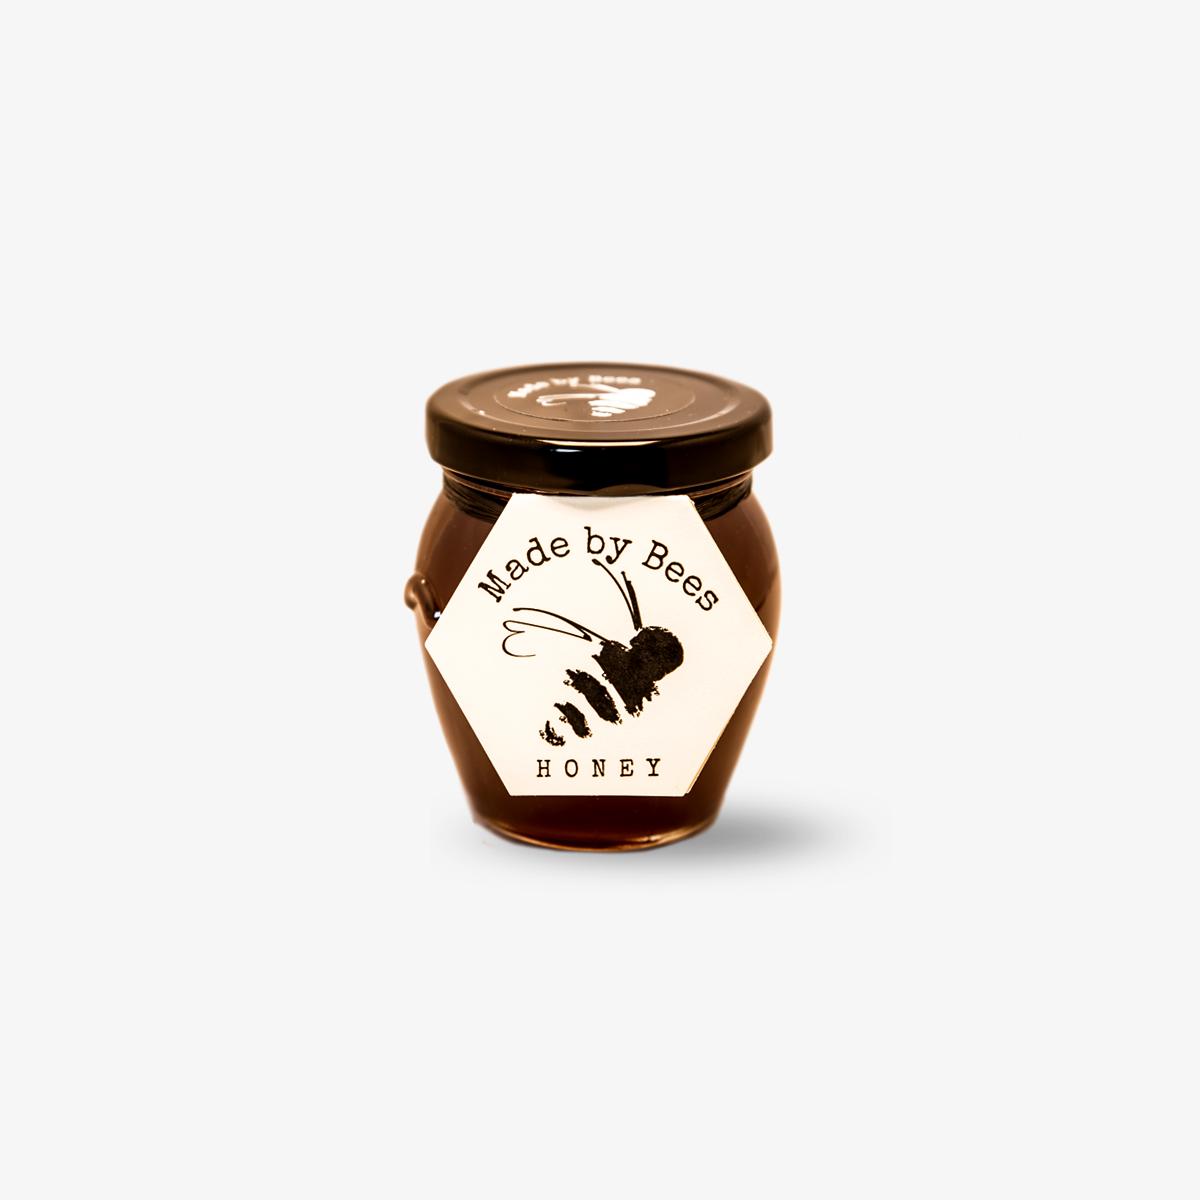 Buckwheat Honey, Made By Bees, 250g